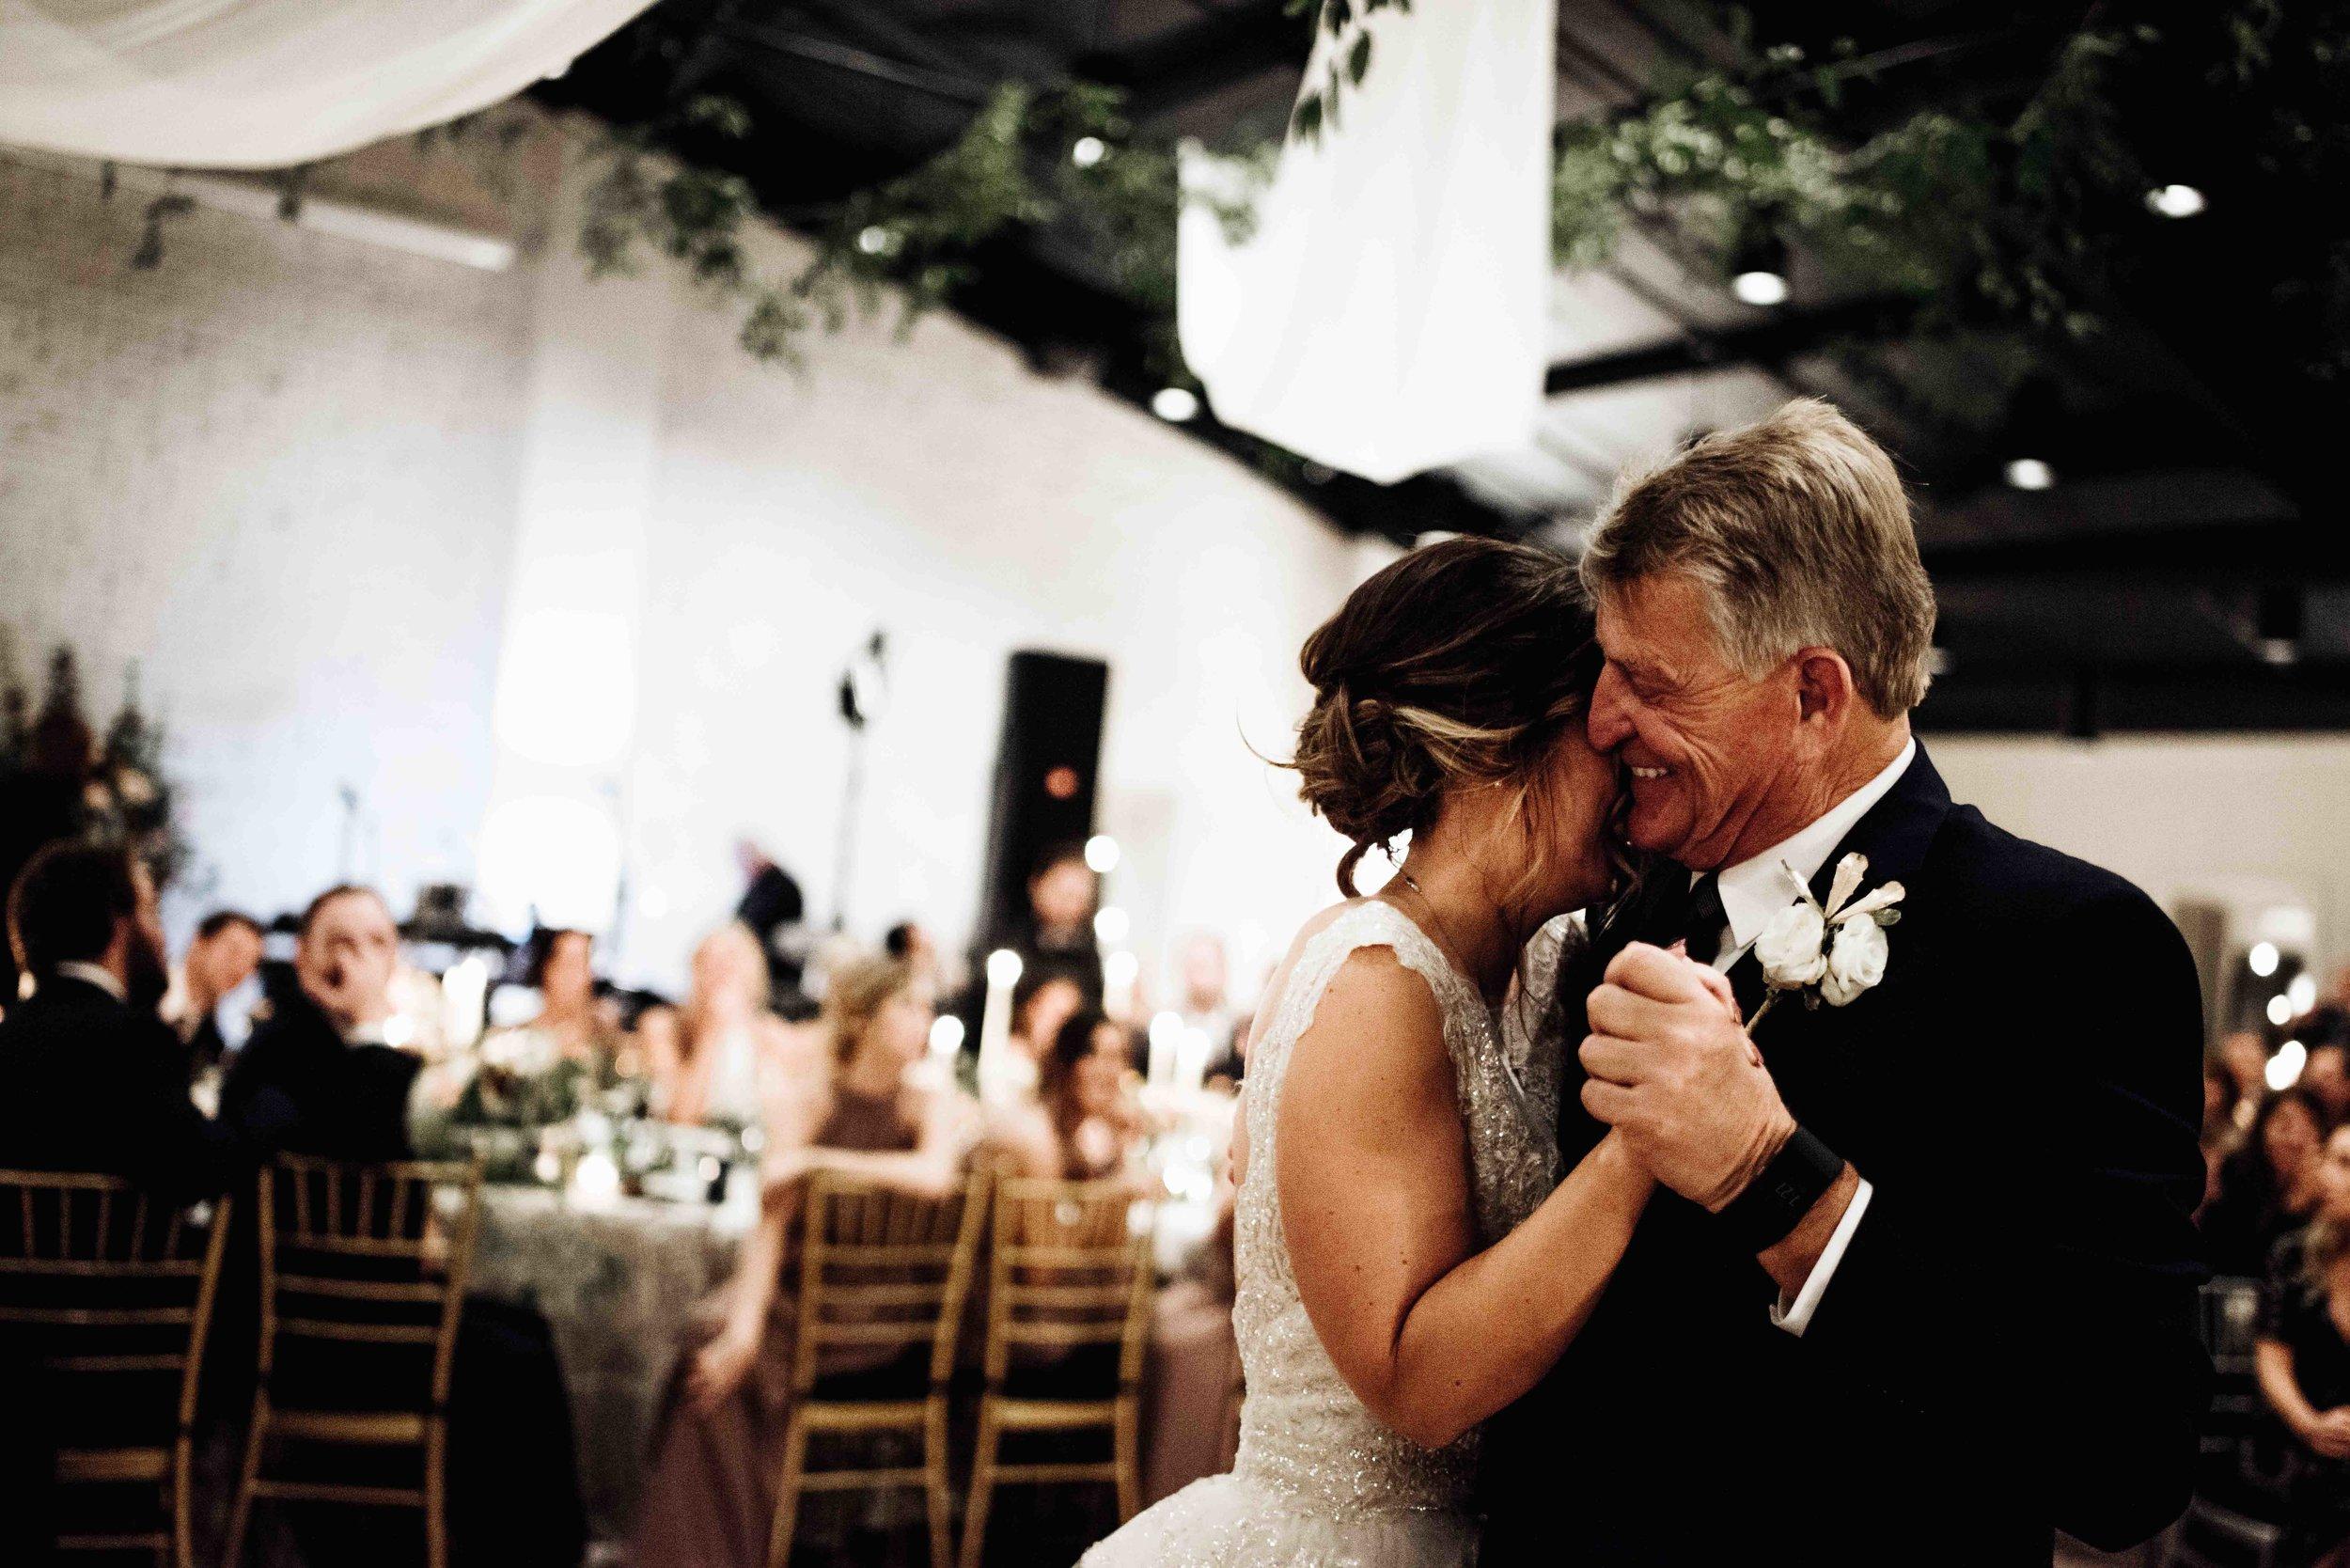 Carlee-Bob-Indianapolis-Wedding-Blog-95.jpg